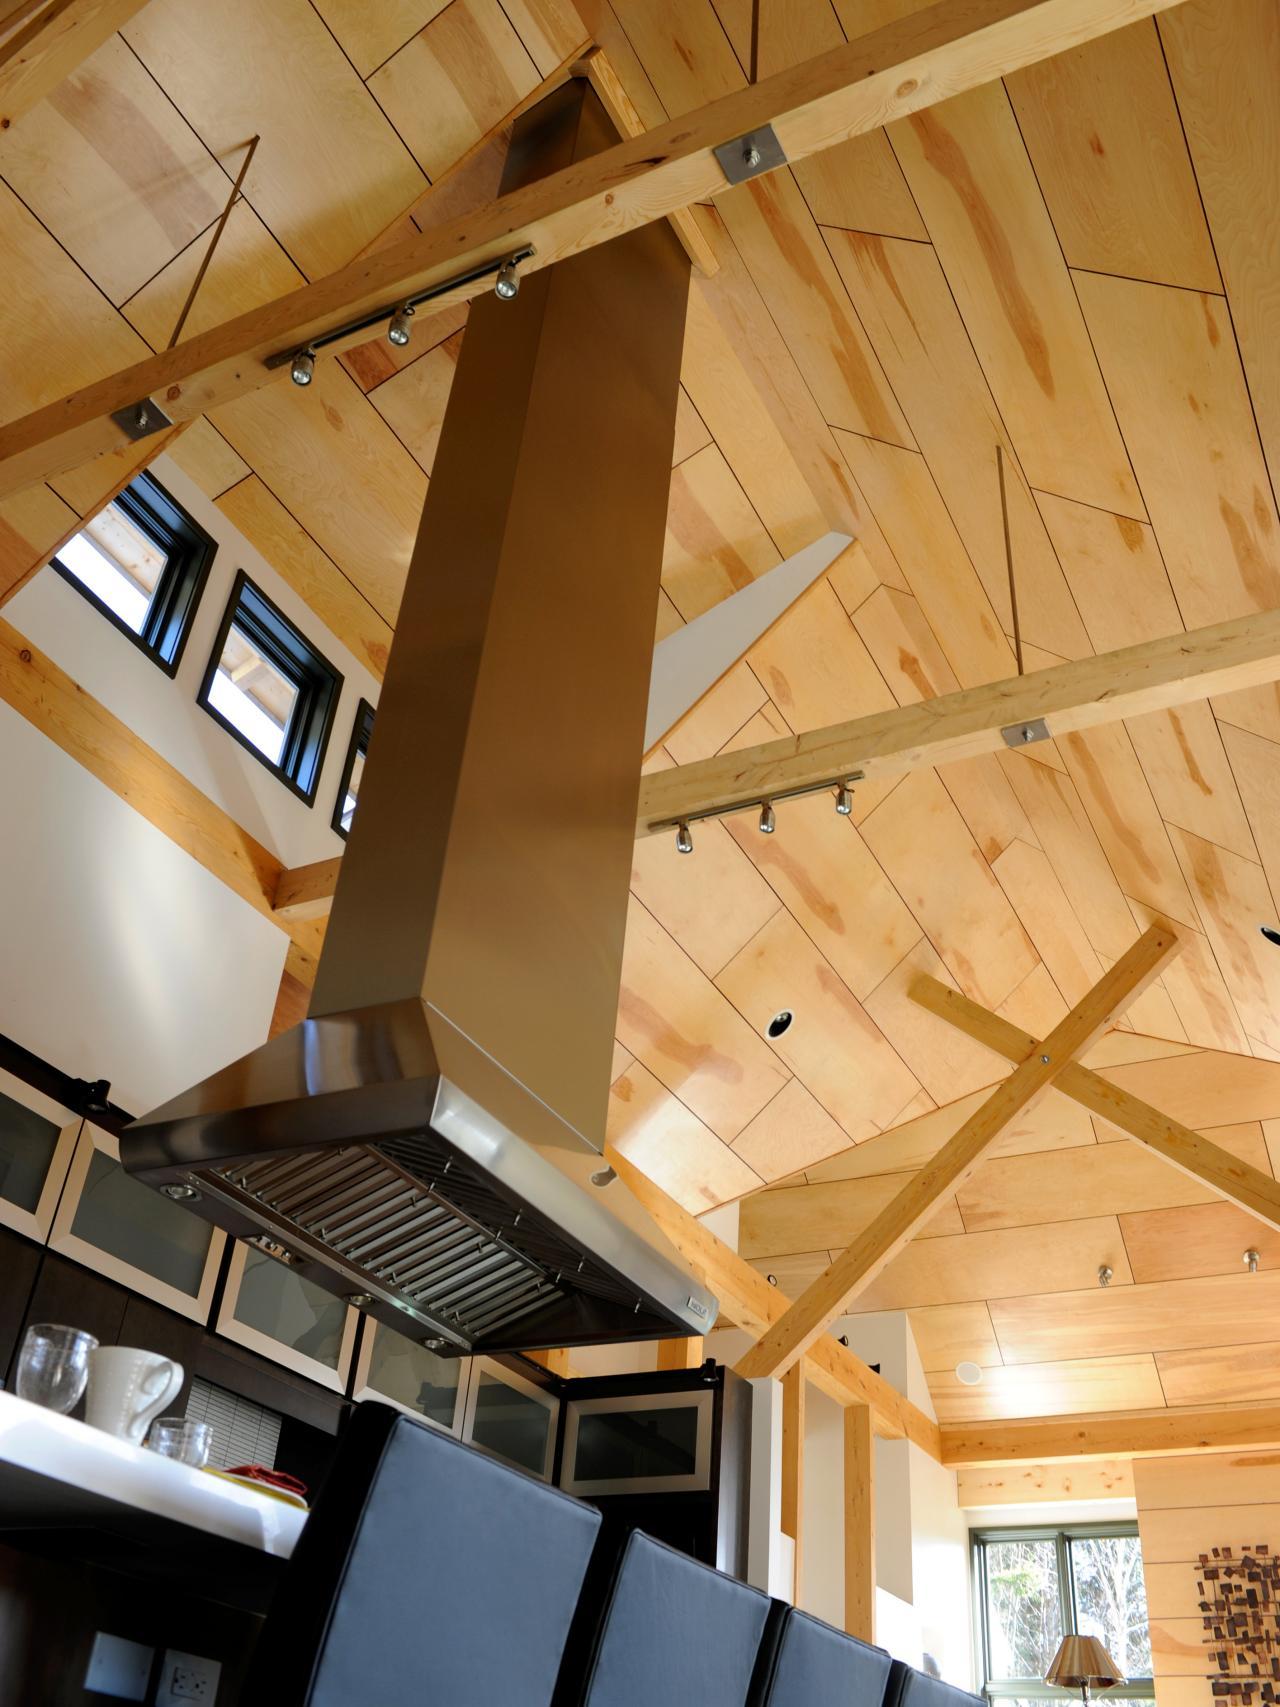 Excellent Installing Island Range Hood Vaulted Ceiling Tiles Et72